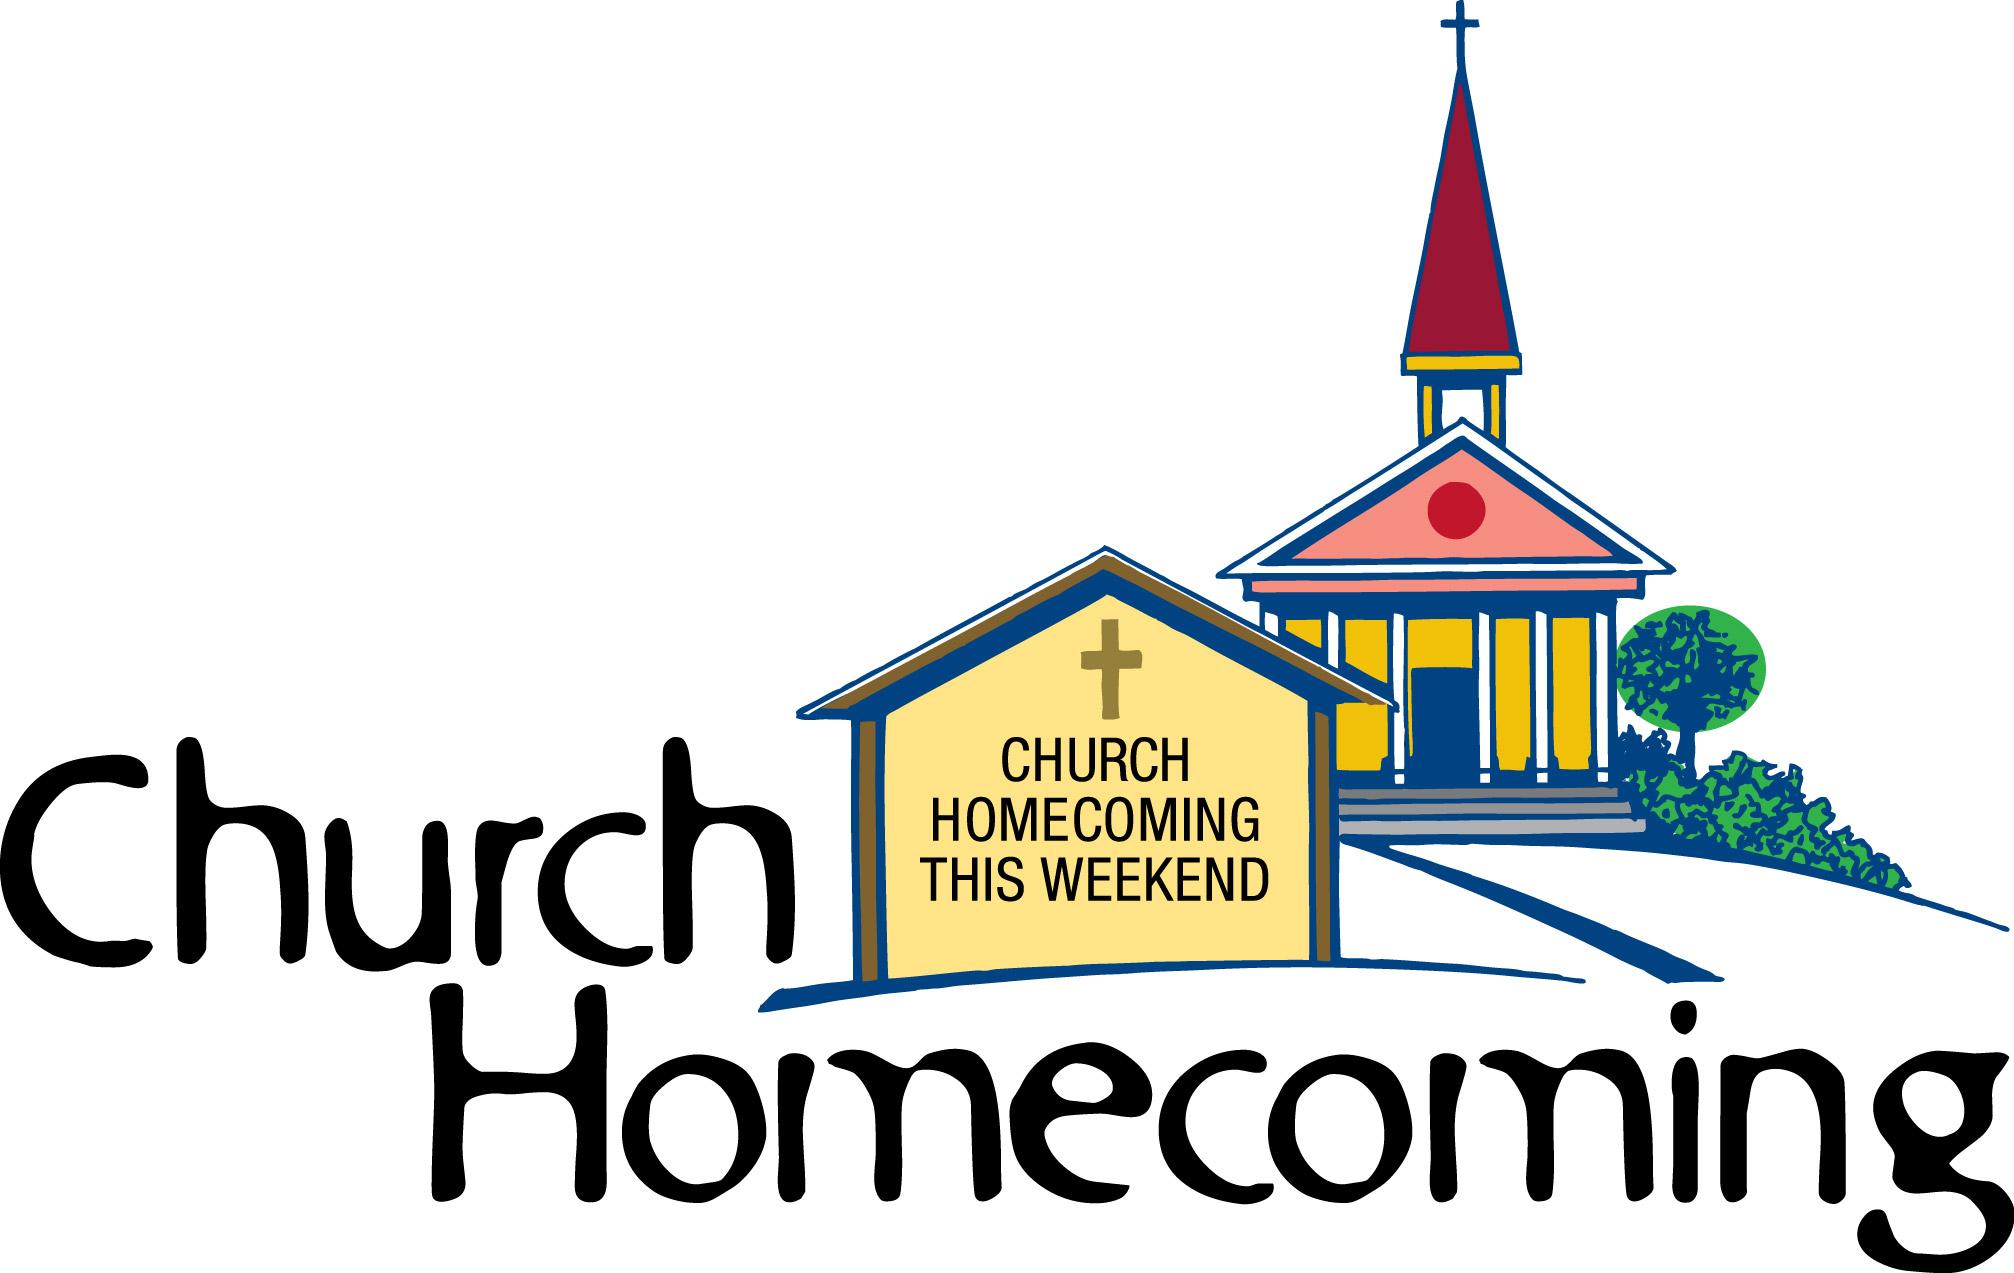 2014x1273 Church Homecoming Clip Art Many Interesting Cliparts